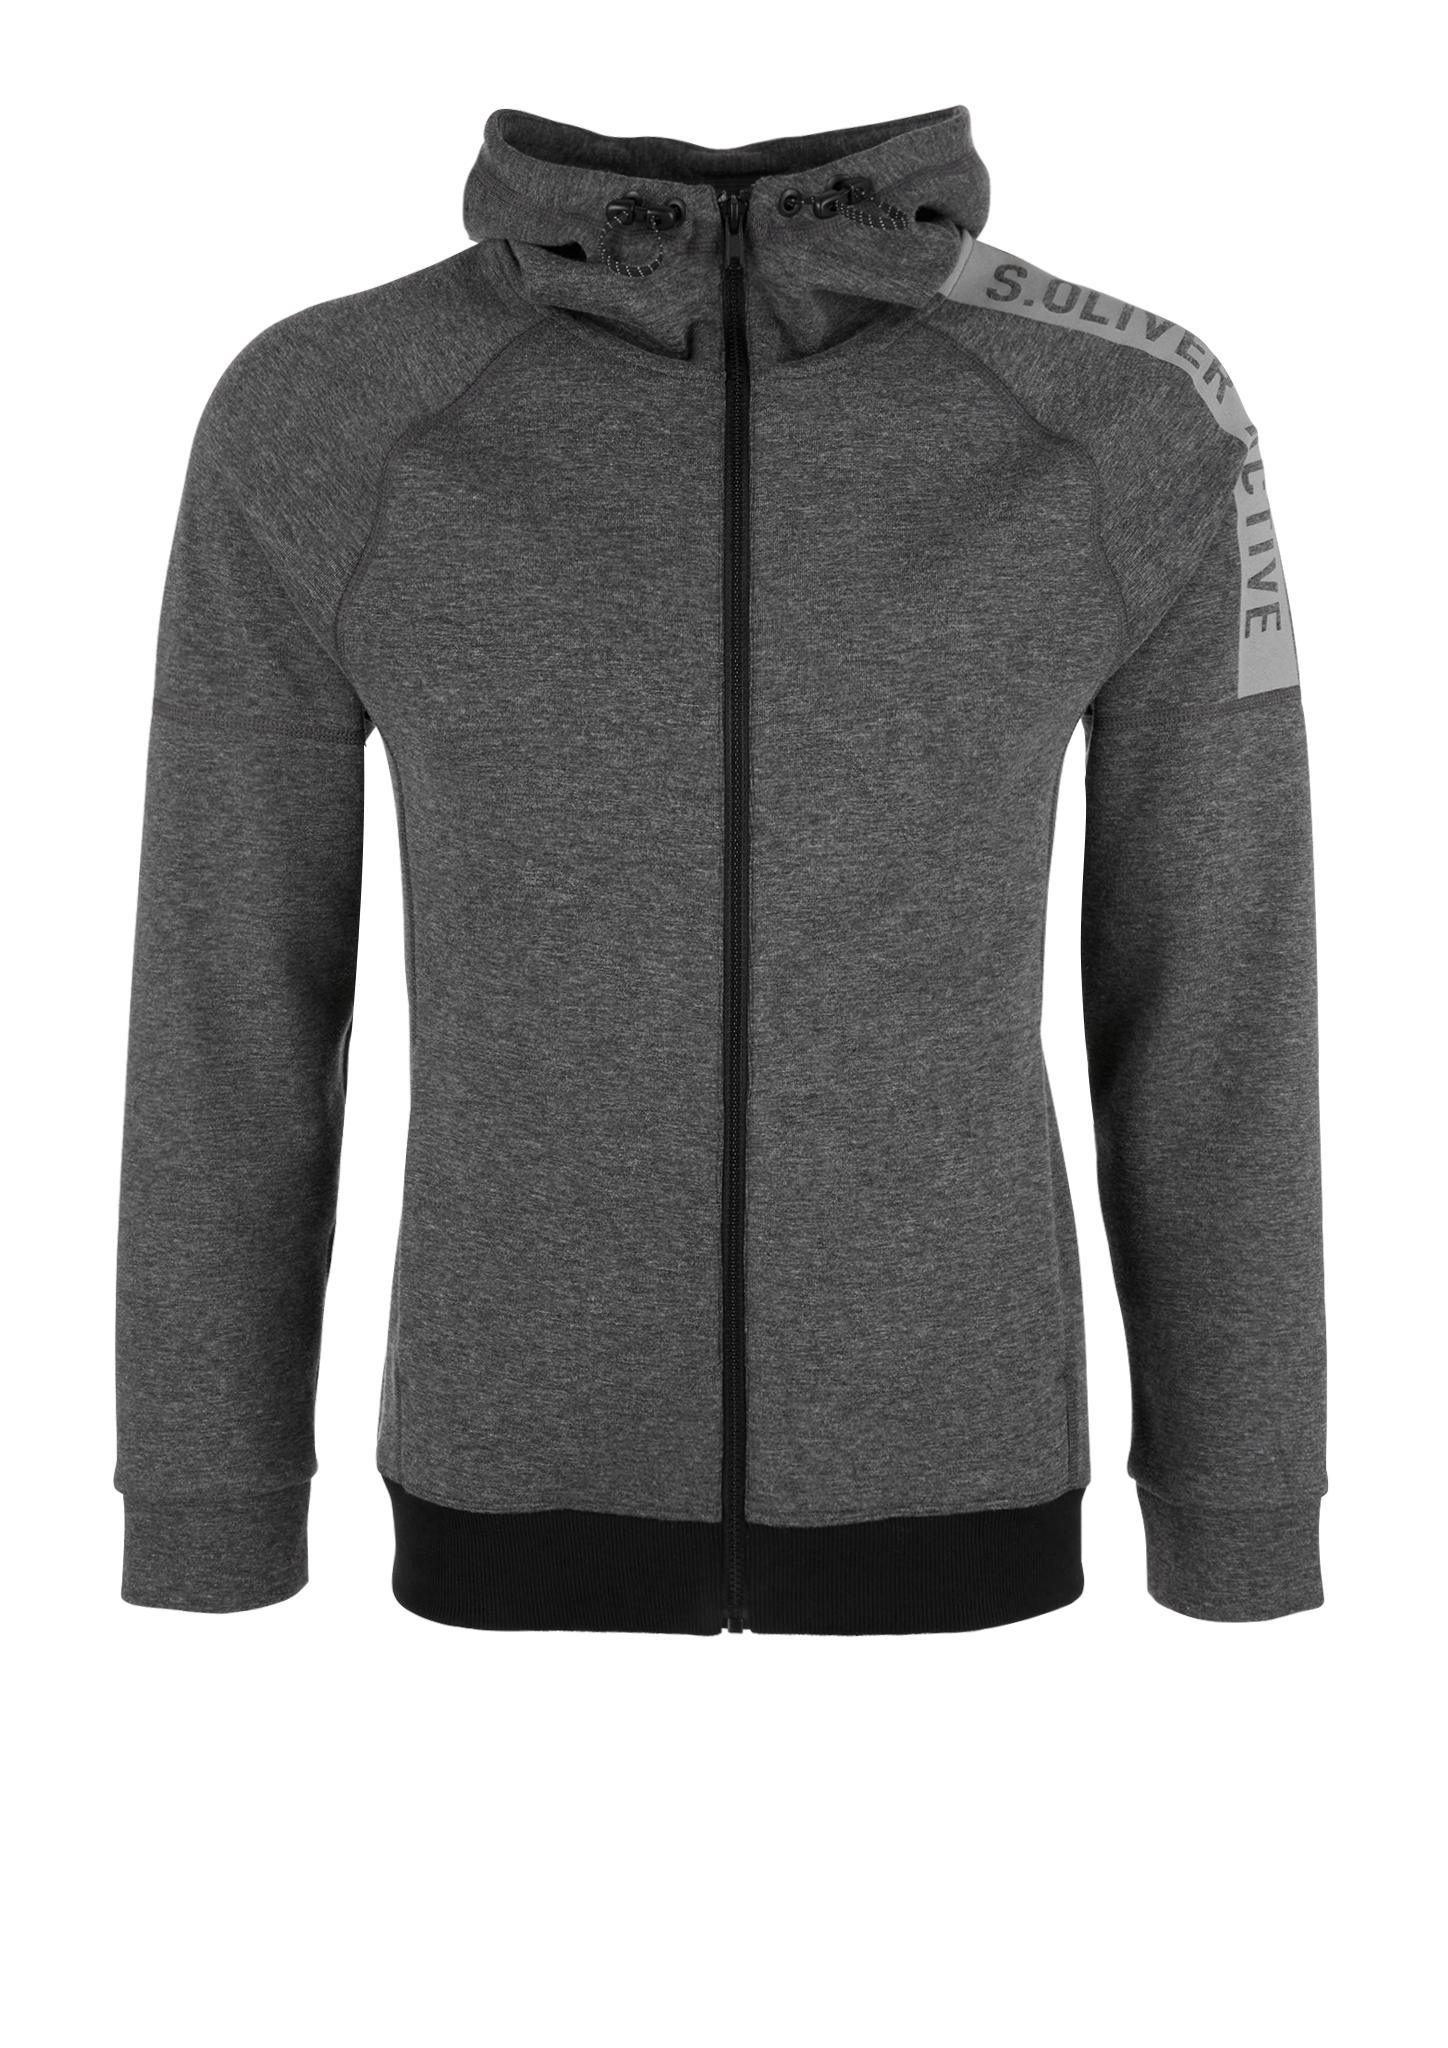 Sporty Sweatjacke | Sportbekleidung | Grau/schwarz | 56% polyester -  44% baumwolle | s.Oliver ACTIVE